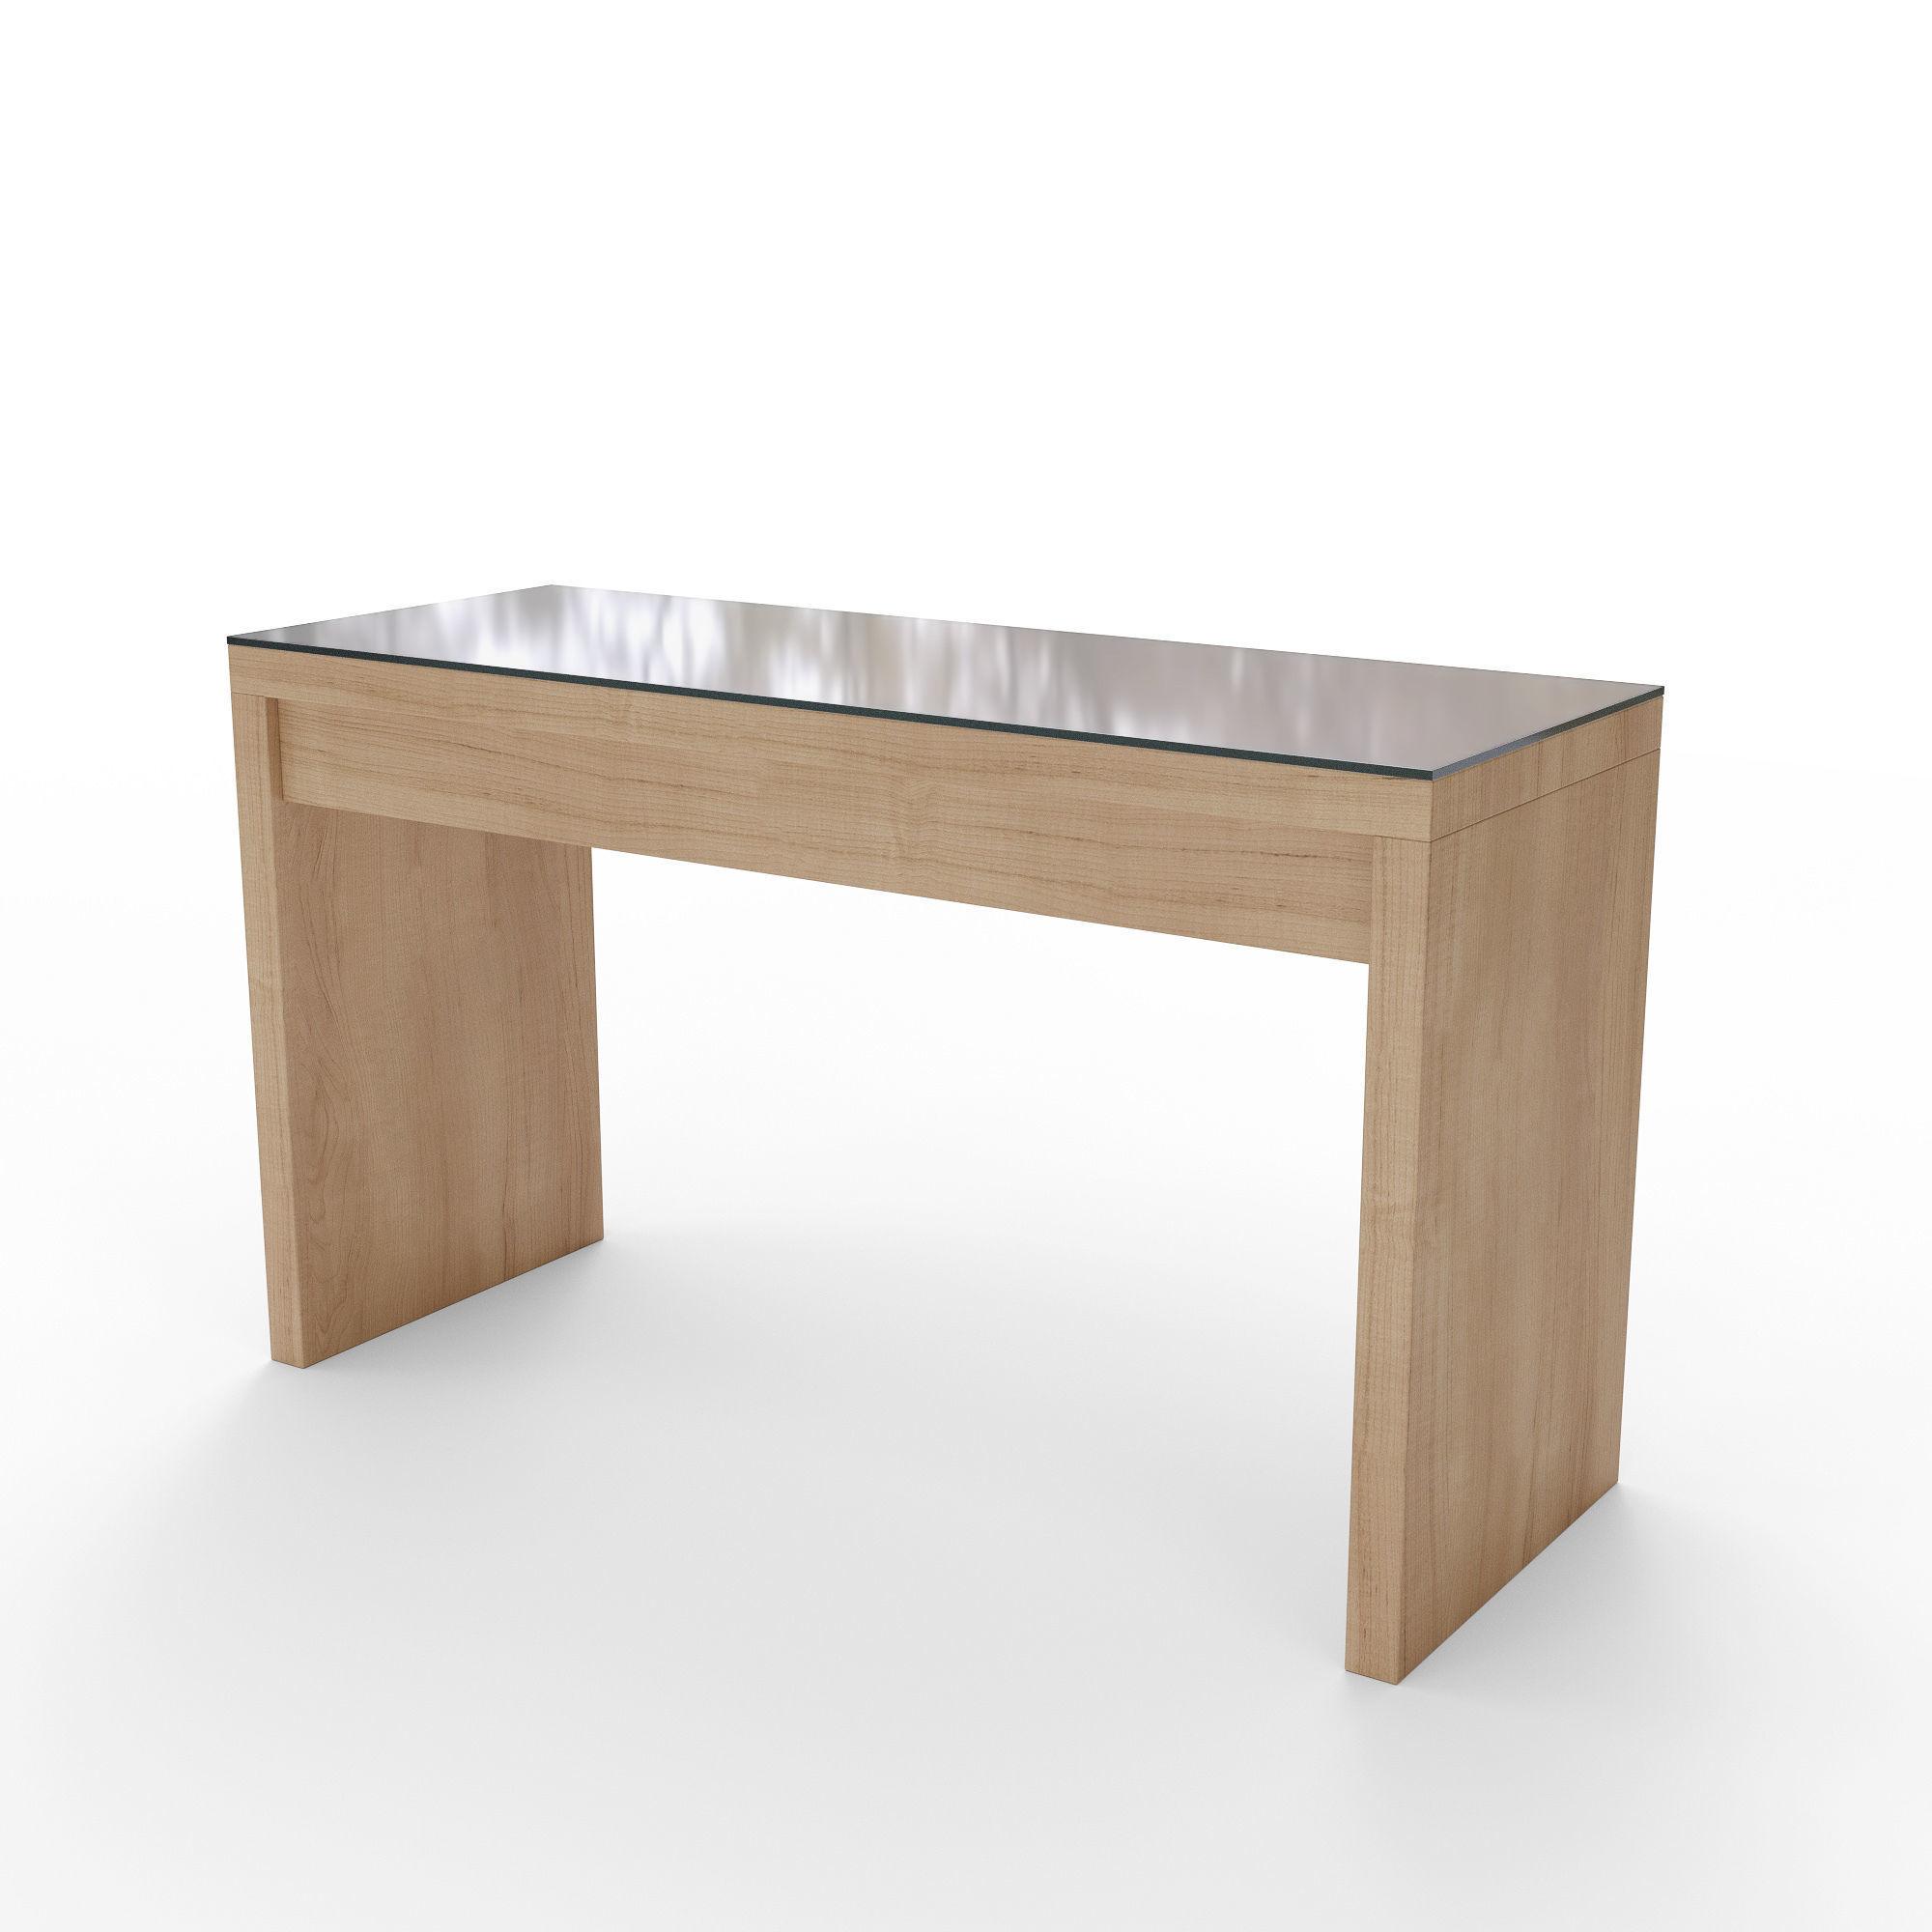 Minimal Style Dressing Table Malm 3d Model Obj 3ds Fbx Dae Mtl ...